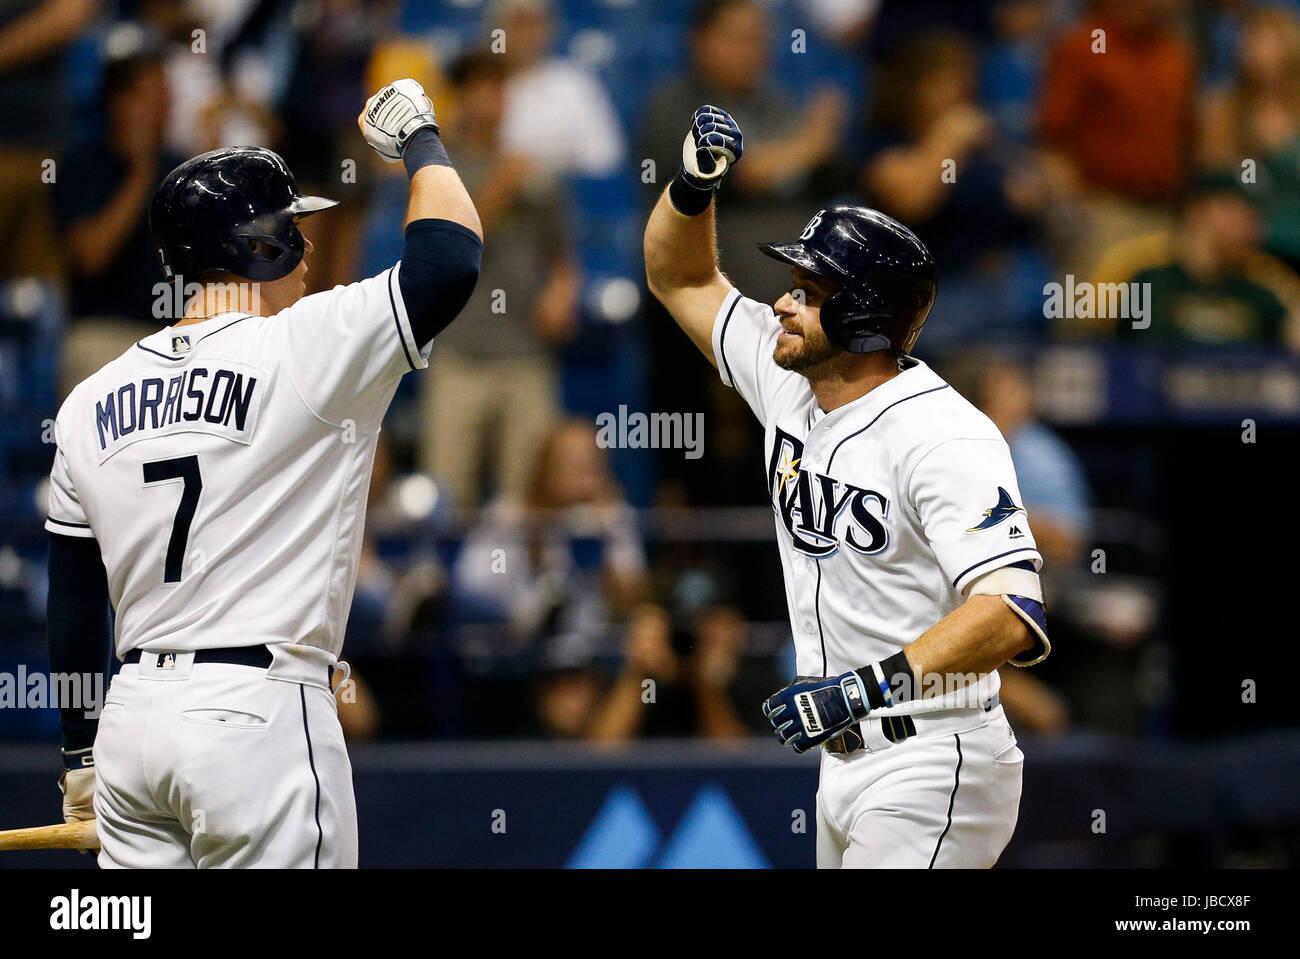 Florida, USA. 10th June, 2017. LOREN ELLIOTT   Times .Tampa Bay Rays third baseman Evan Longoria (3) celebrates - Stock Image